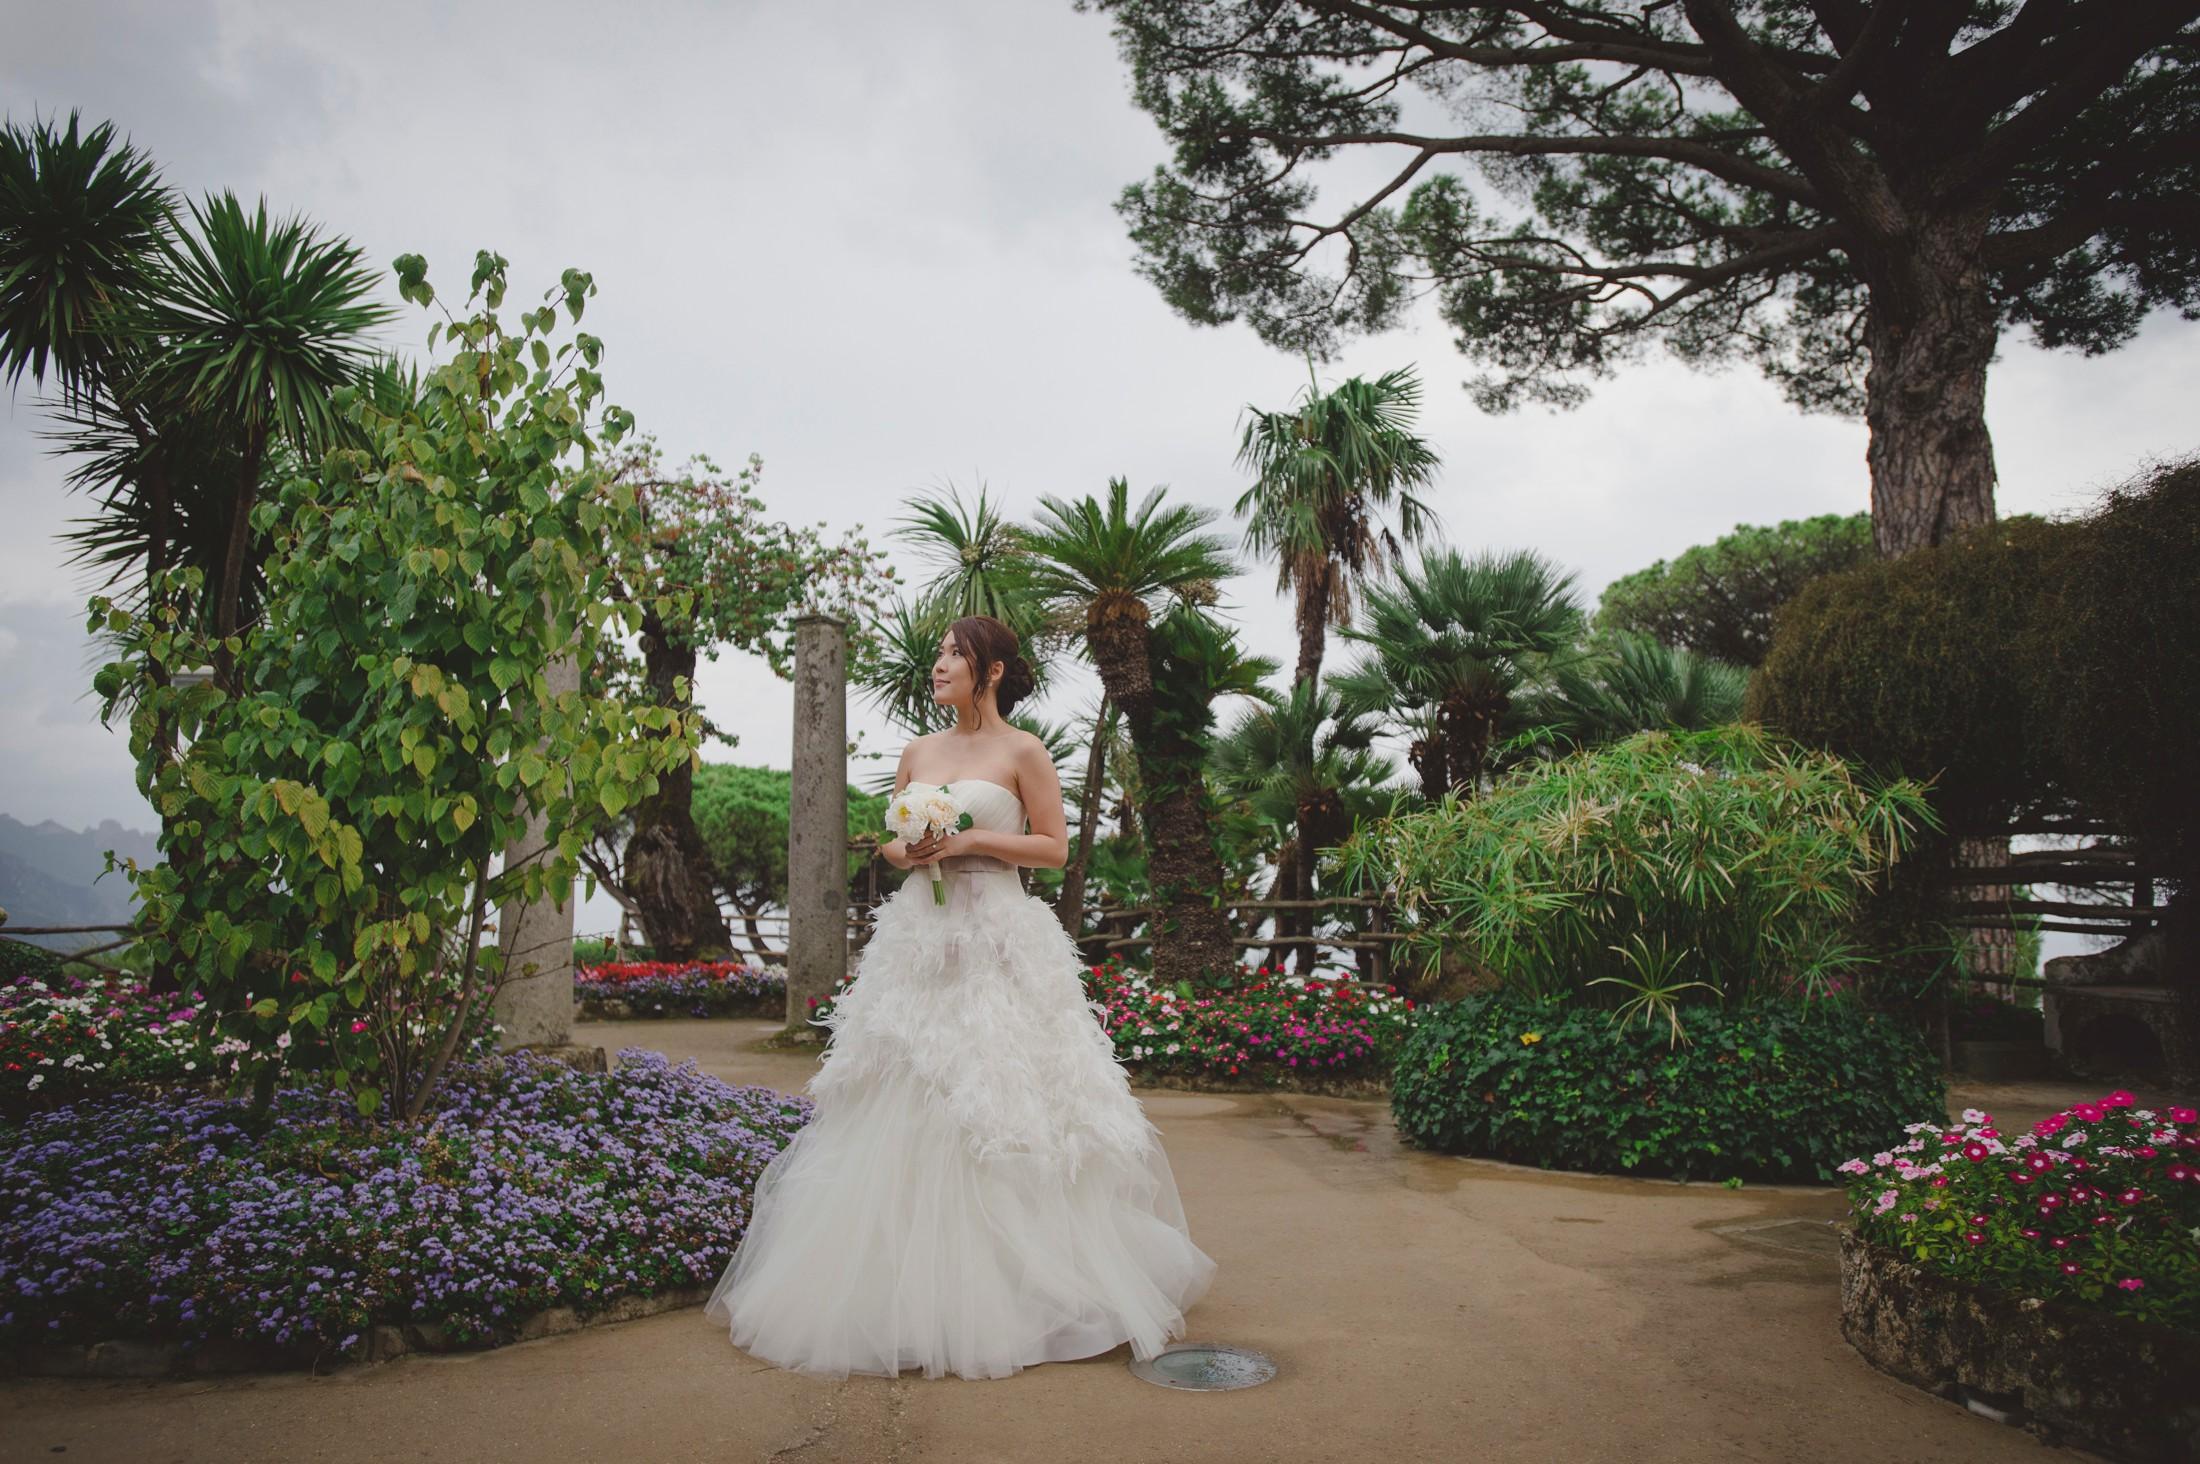 wedding on the amalfi coat bride' s portrait at villa rufolo in ravello